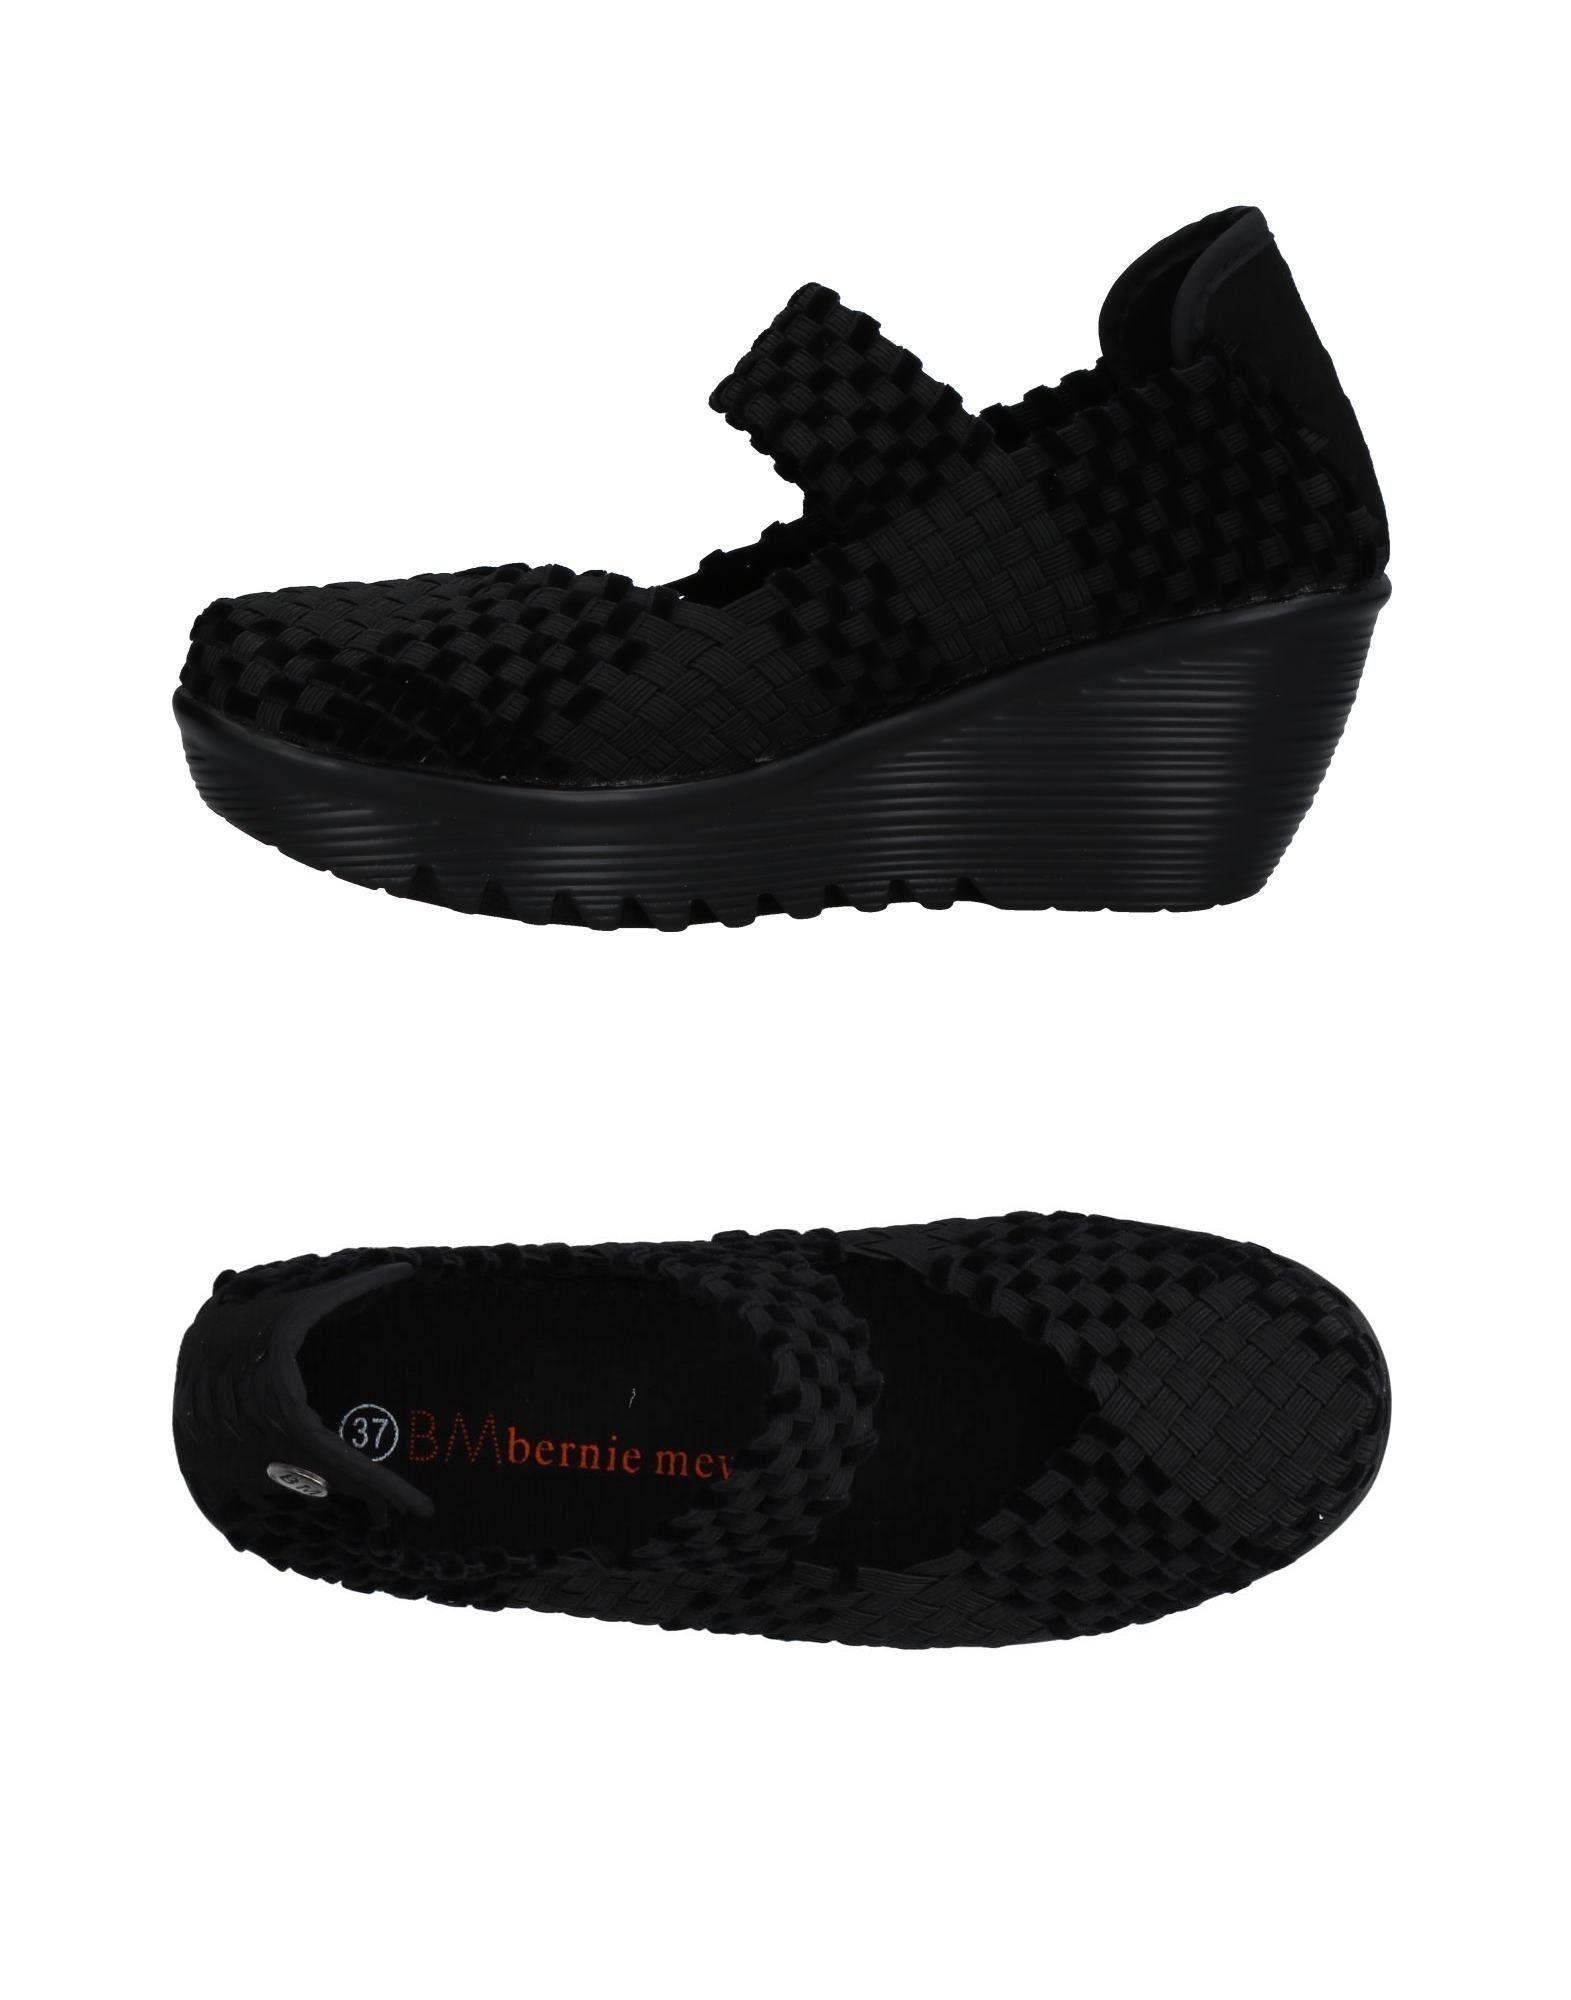 Bernie Mev. Sneakers Damen  11405166JB Gute Qualität beliebte Schuhe